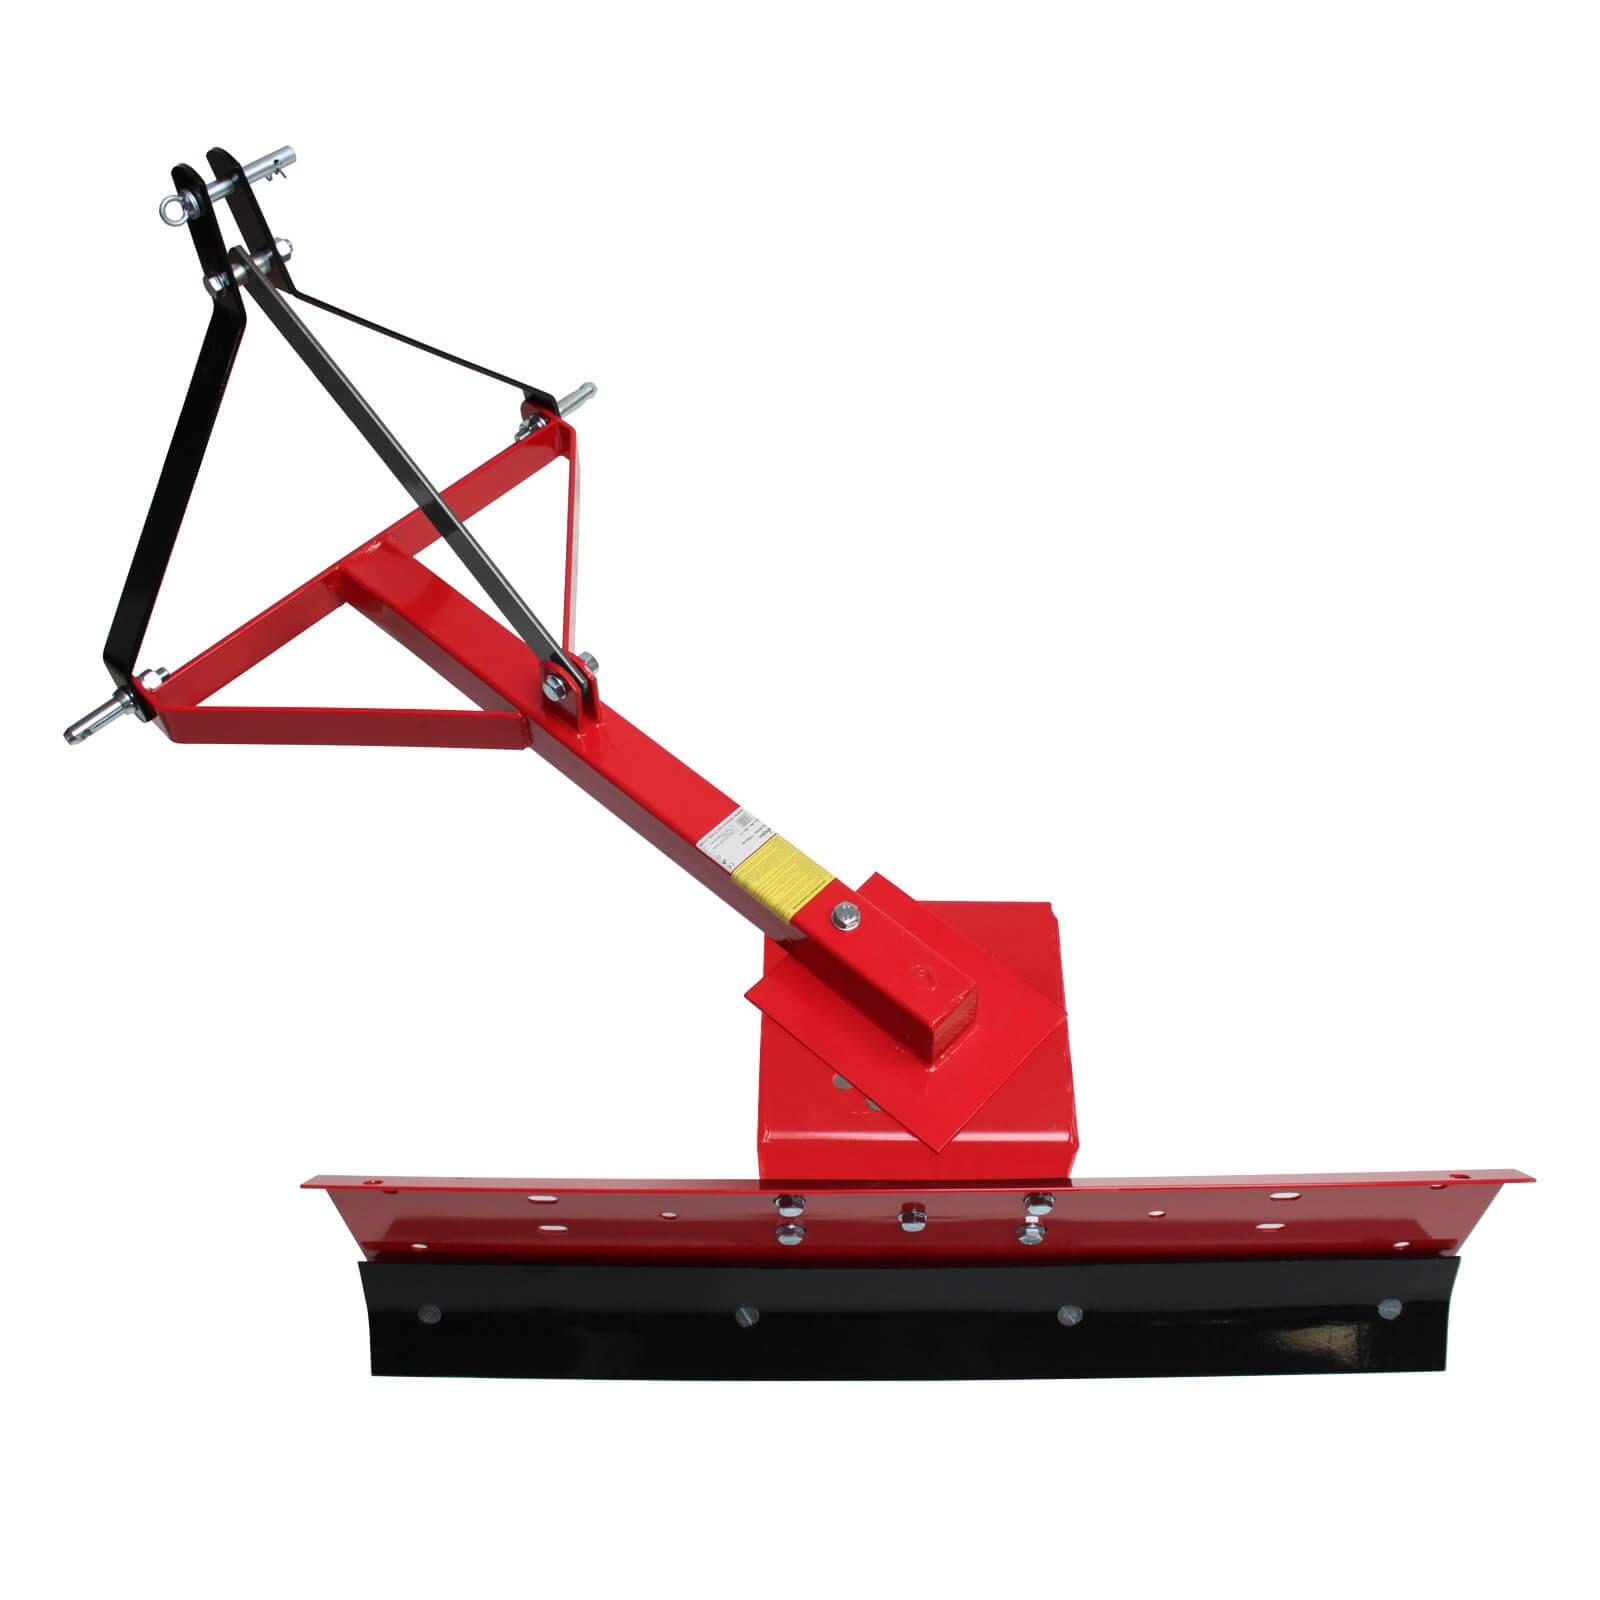 planierschild planierschieber 120 cm f r traktor kat 1. Black Bedroom Furniture Sets. Home Design Ideas